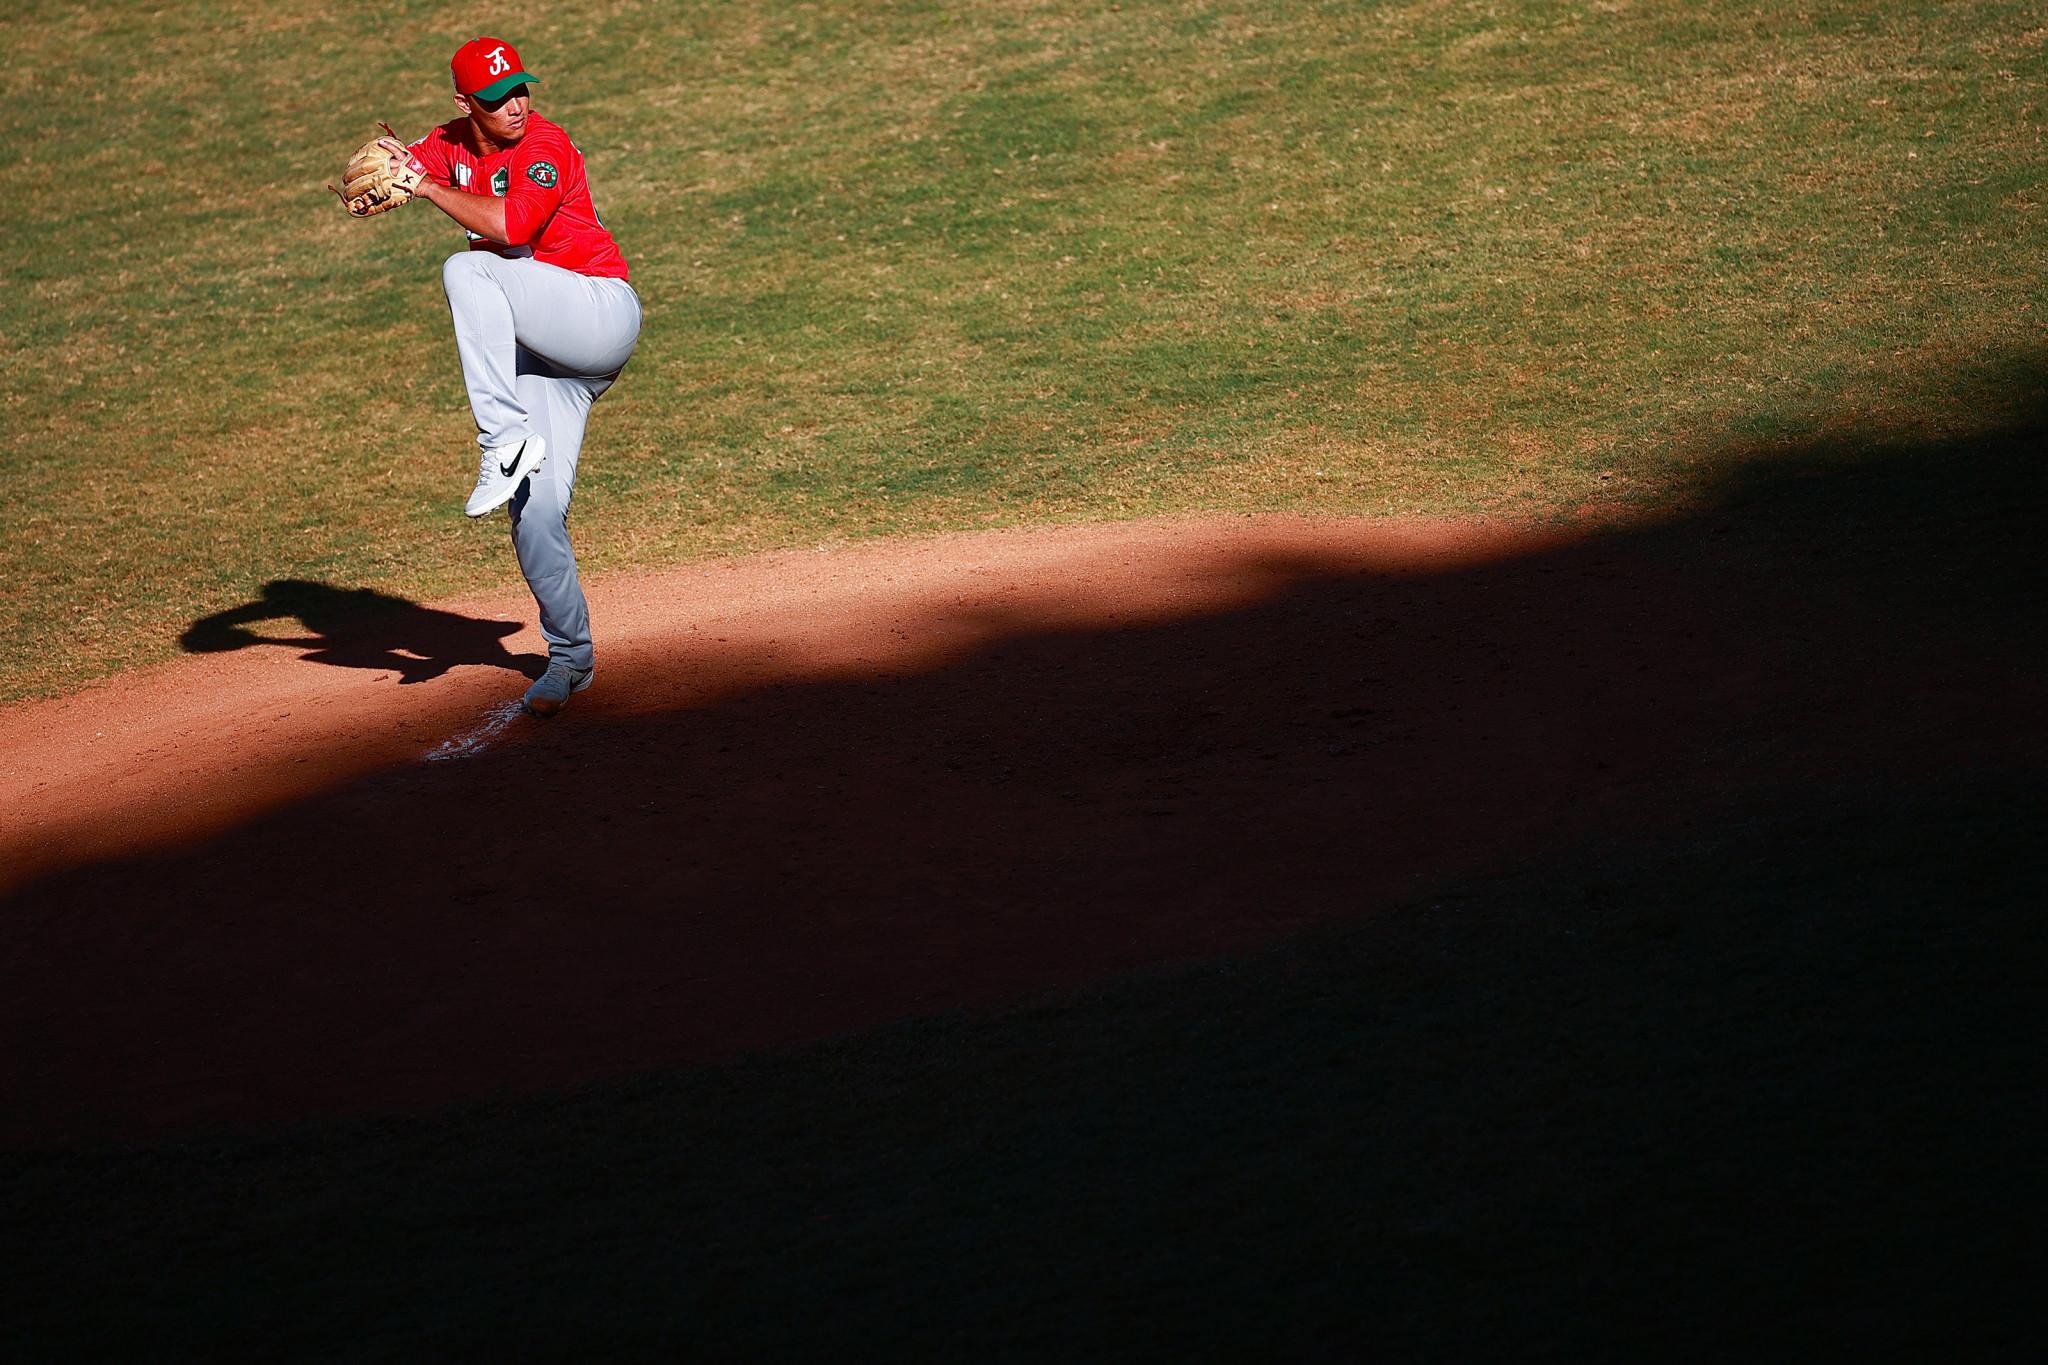 Panama upset Venezuela to secure Group B qualification at Under-23 Baseball World Cup